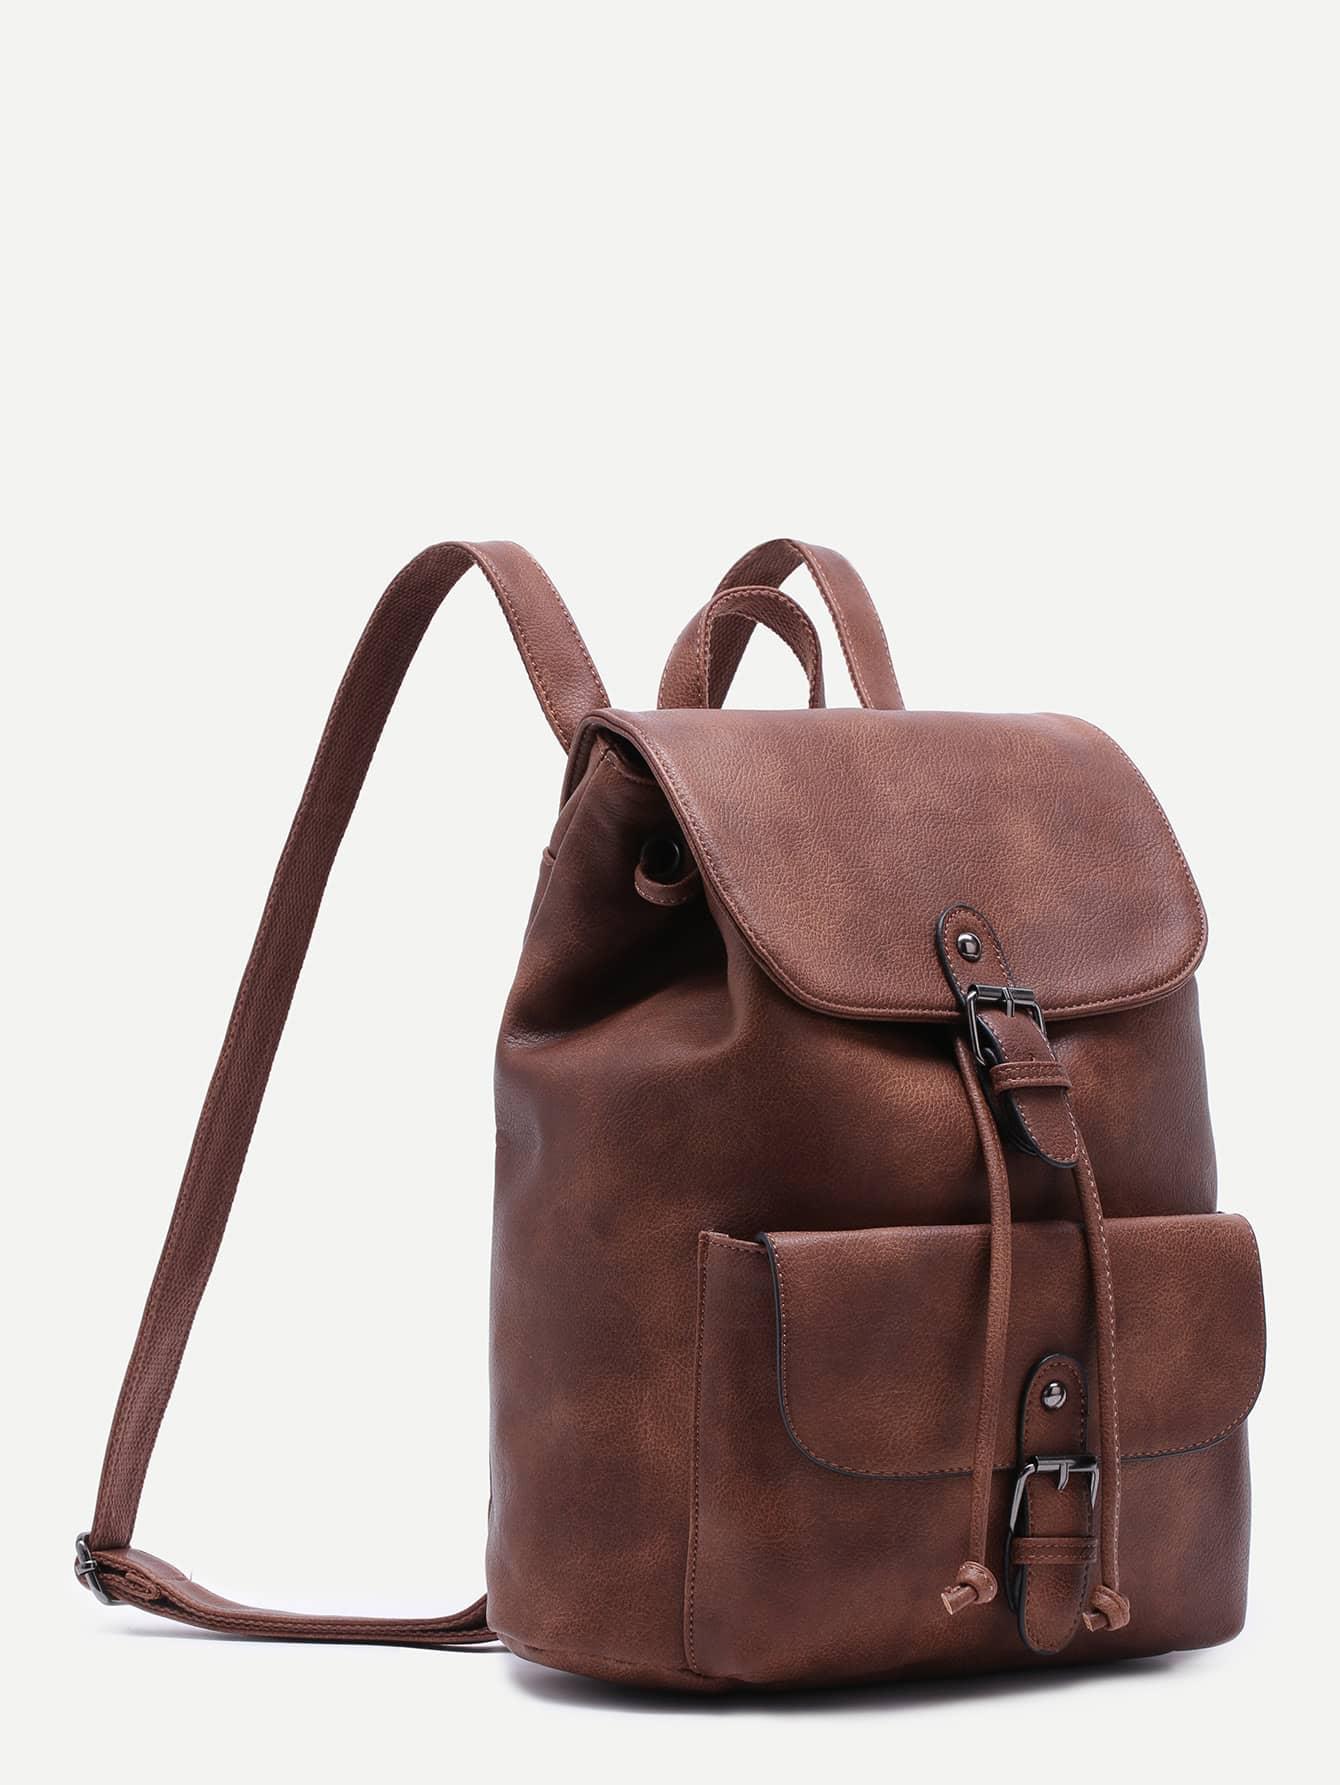 bag161014907_2